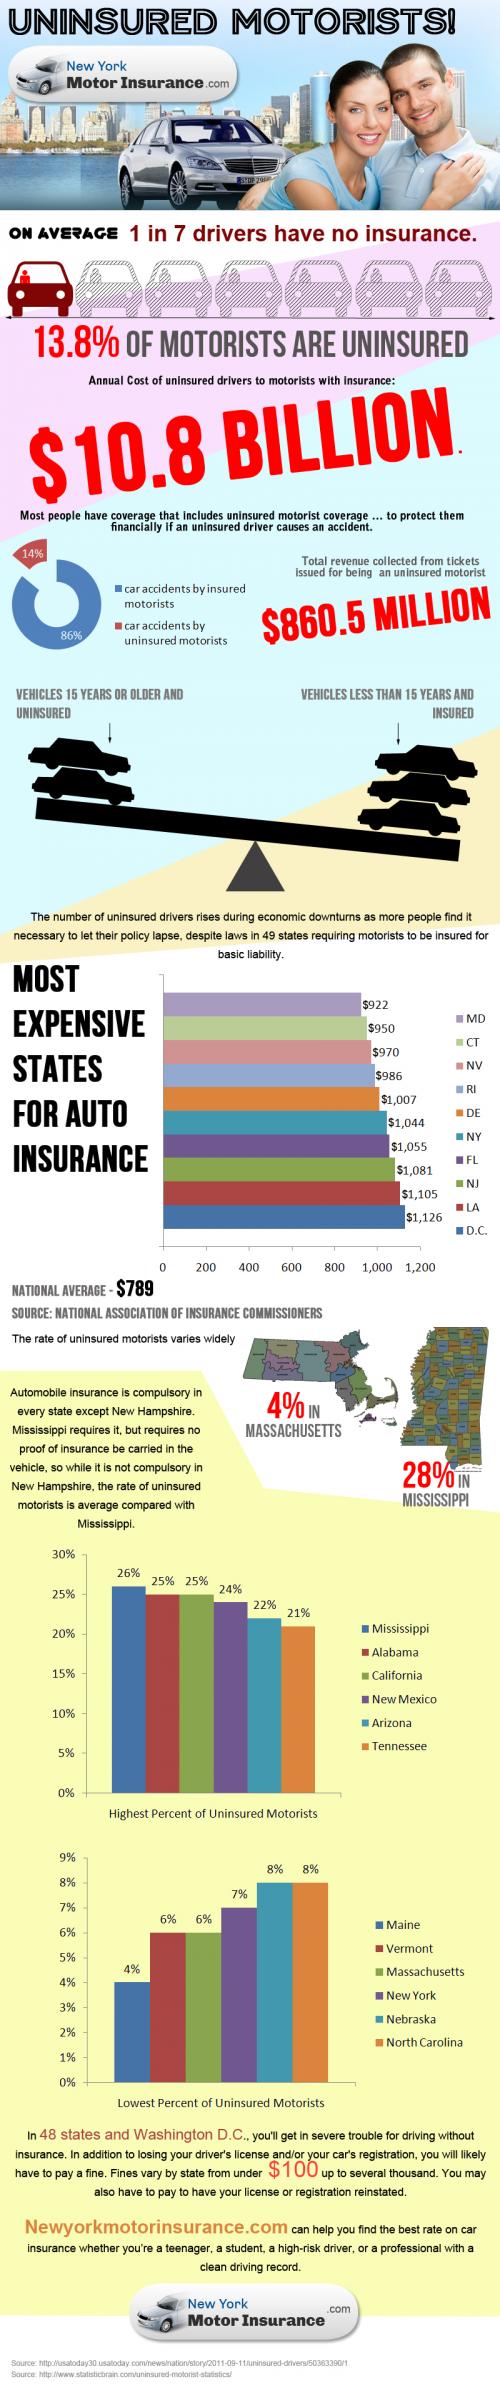 NewYorkMotorInsurance.com'